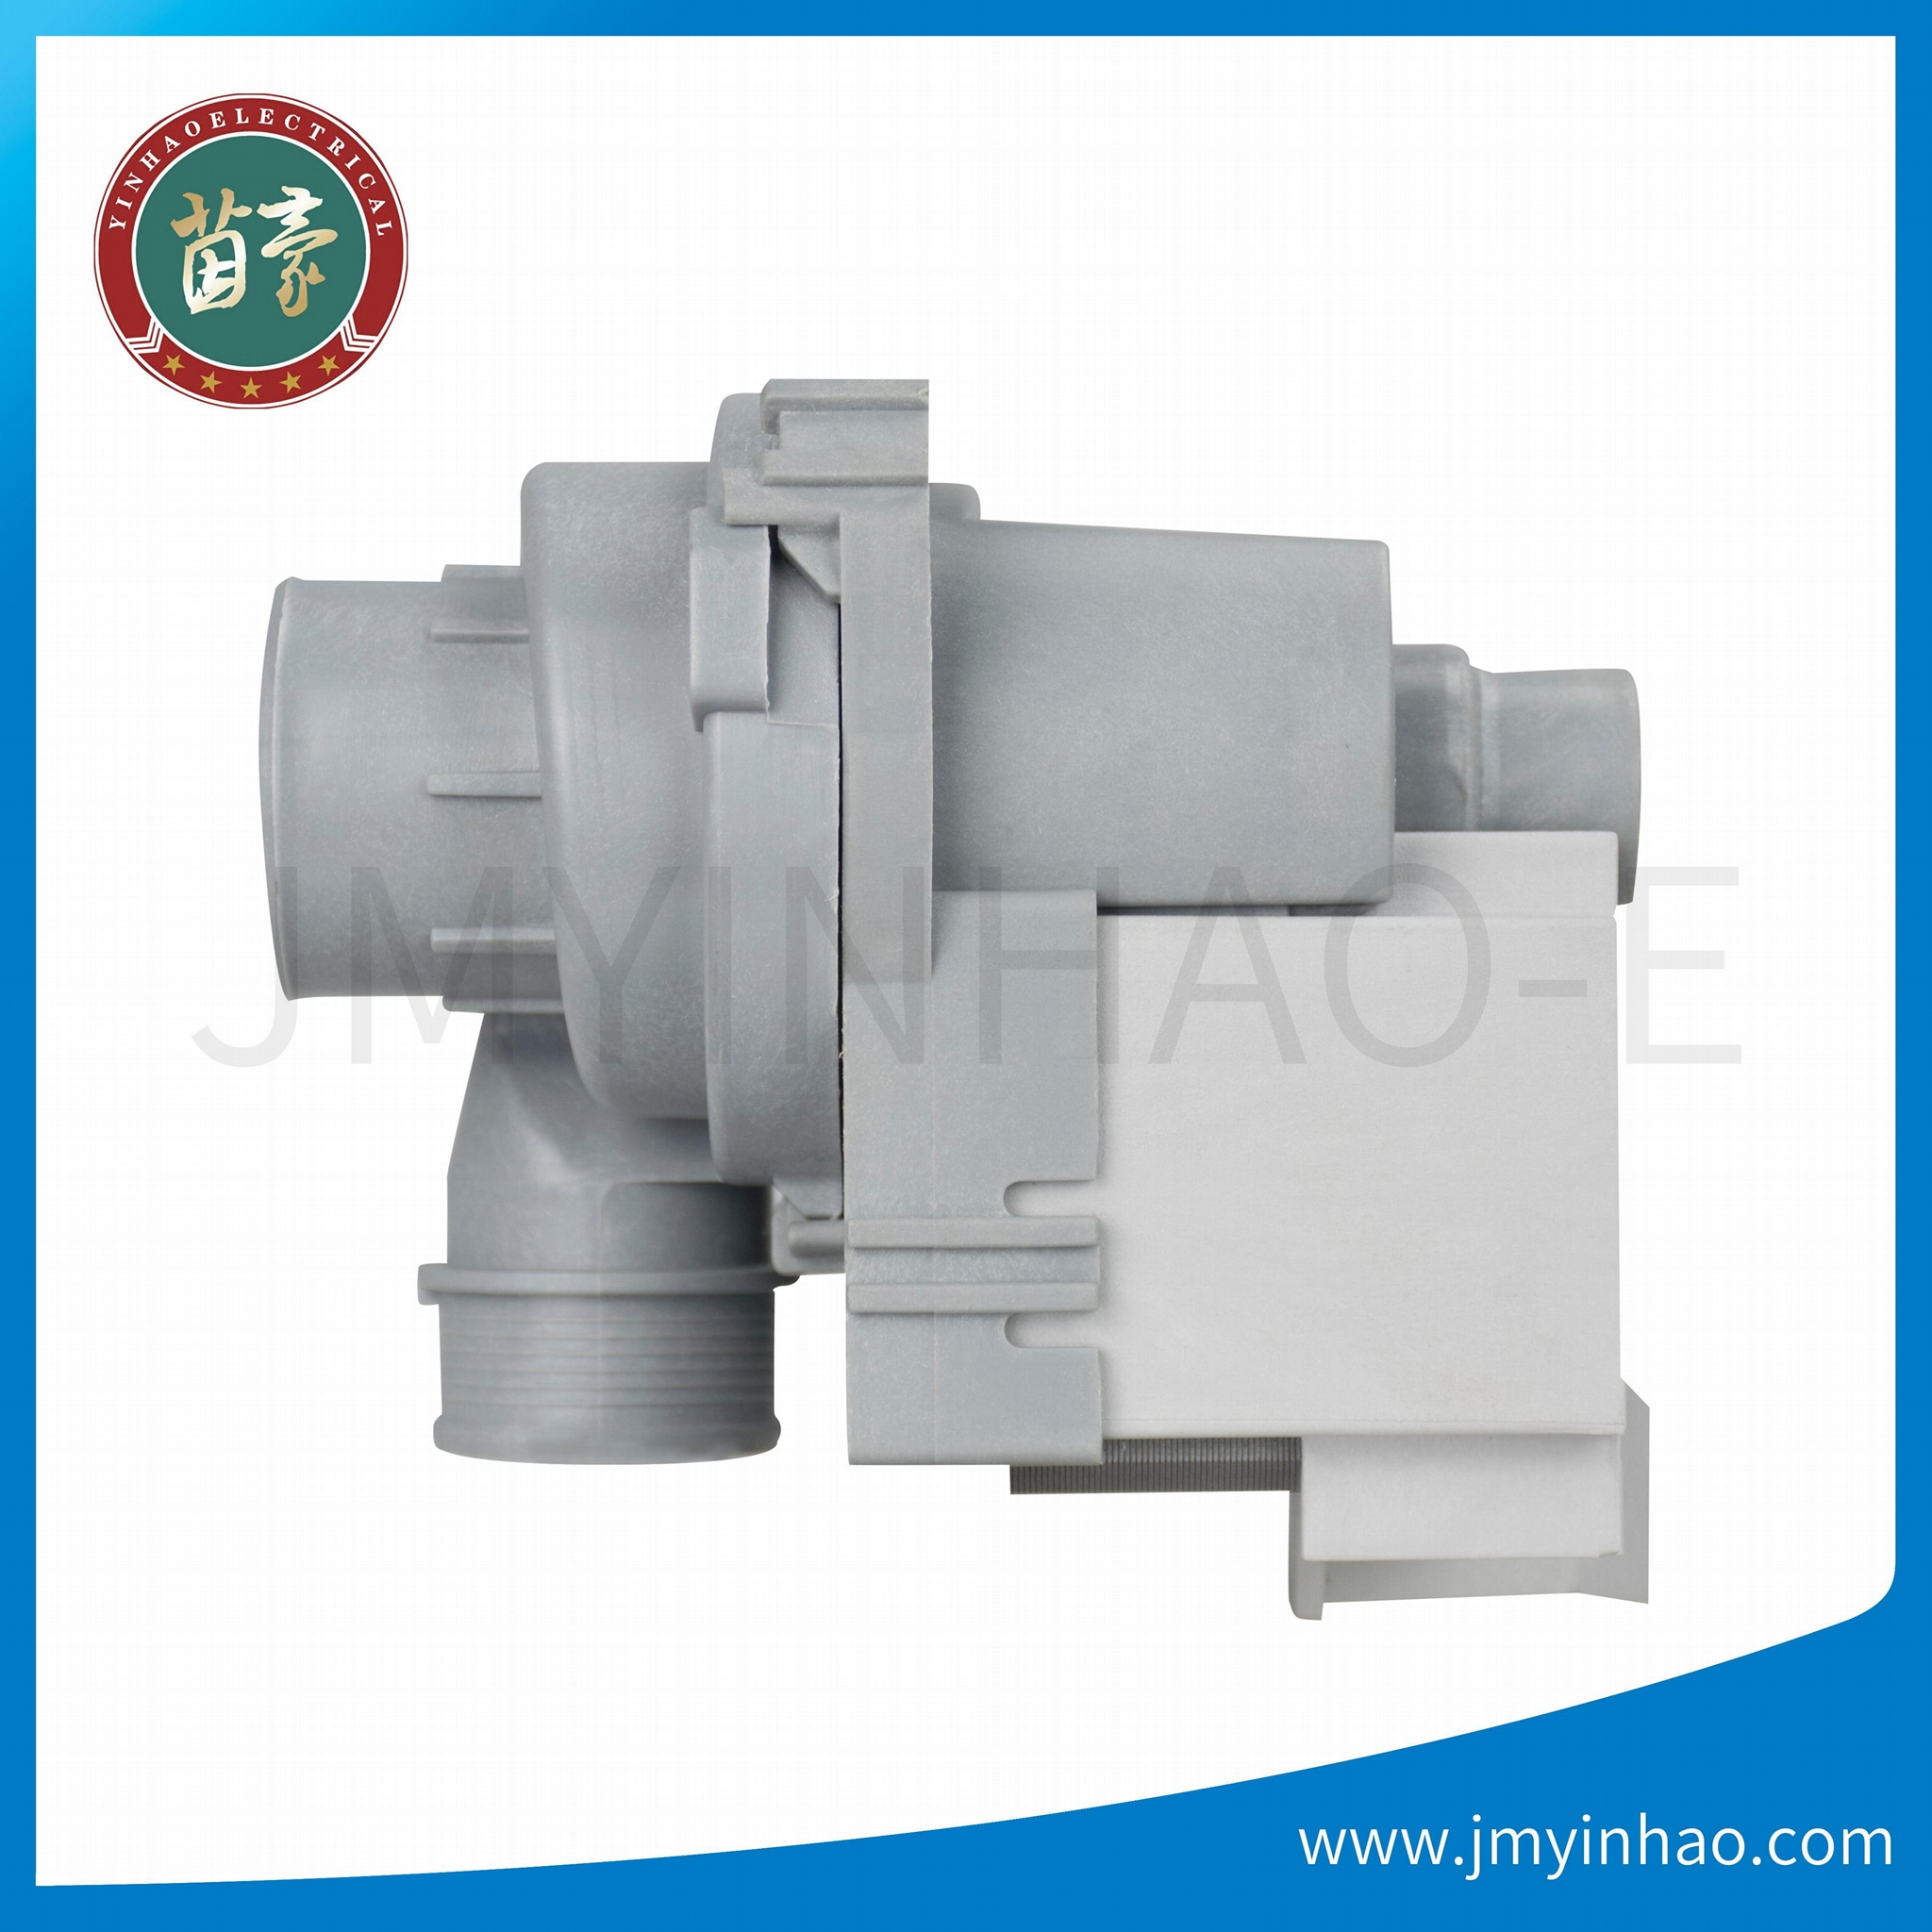 Yinhao drain pump for dishwasher